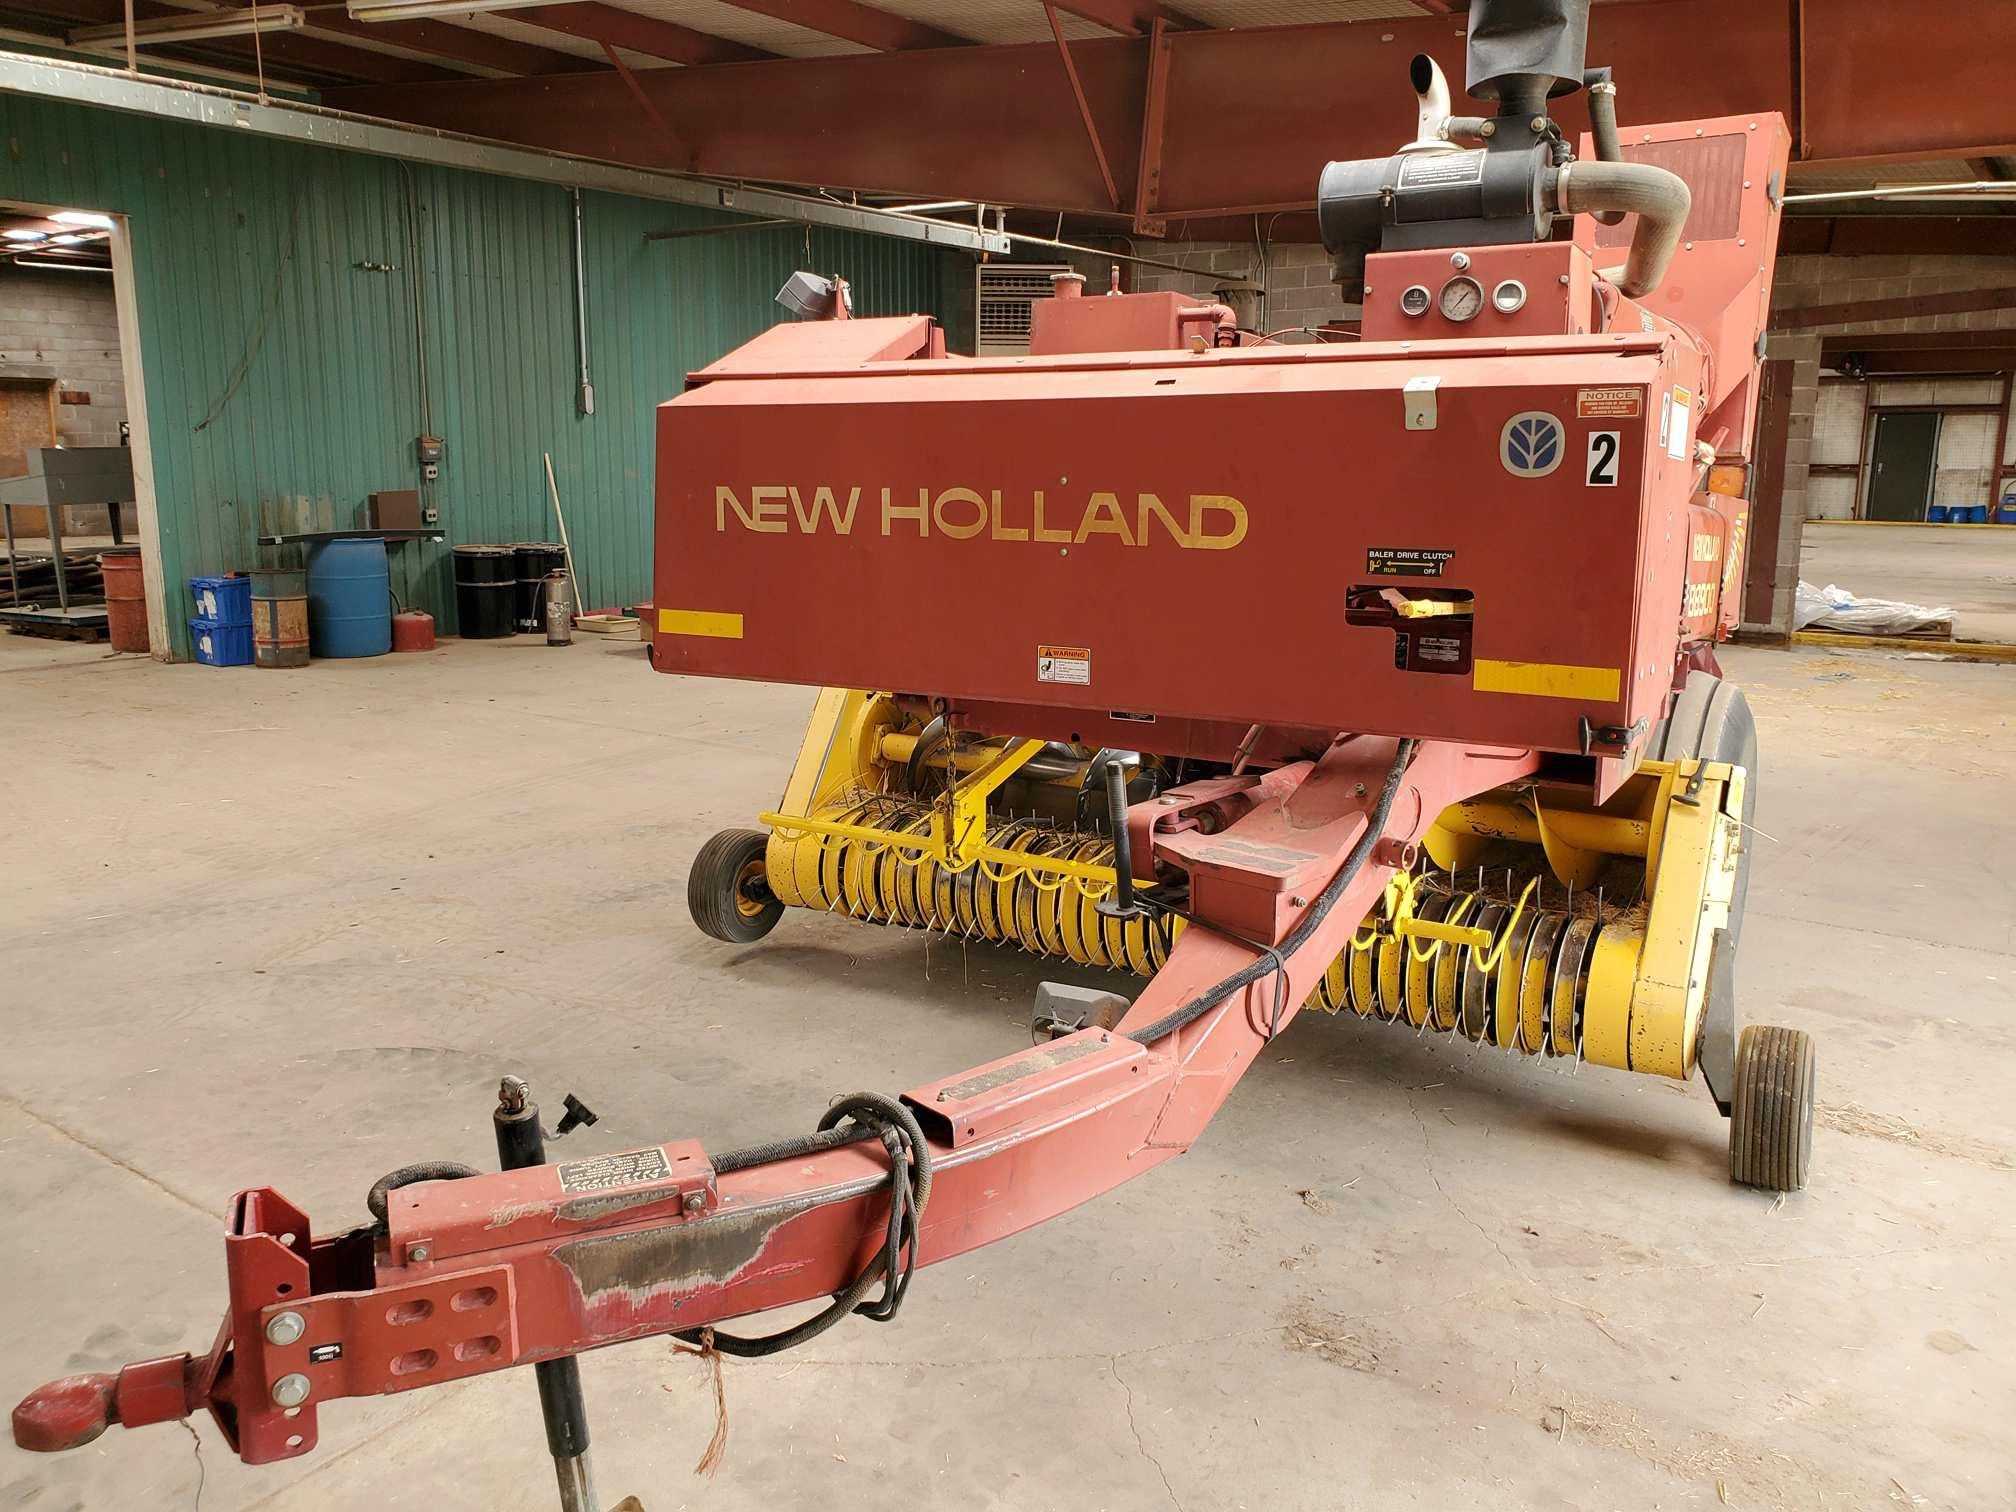 2003 New Holland BB900 Big Square Baler